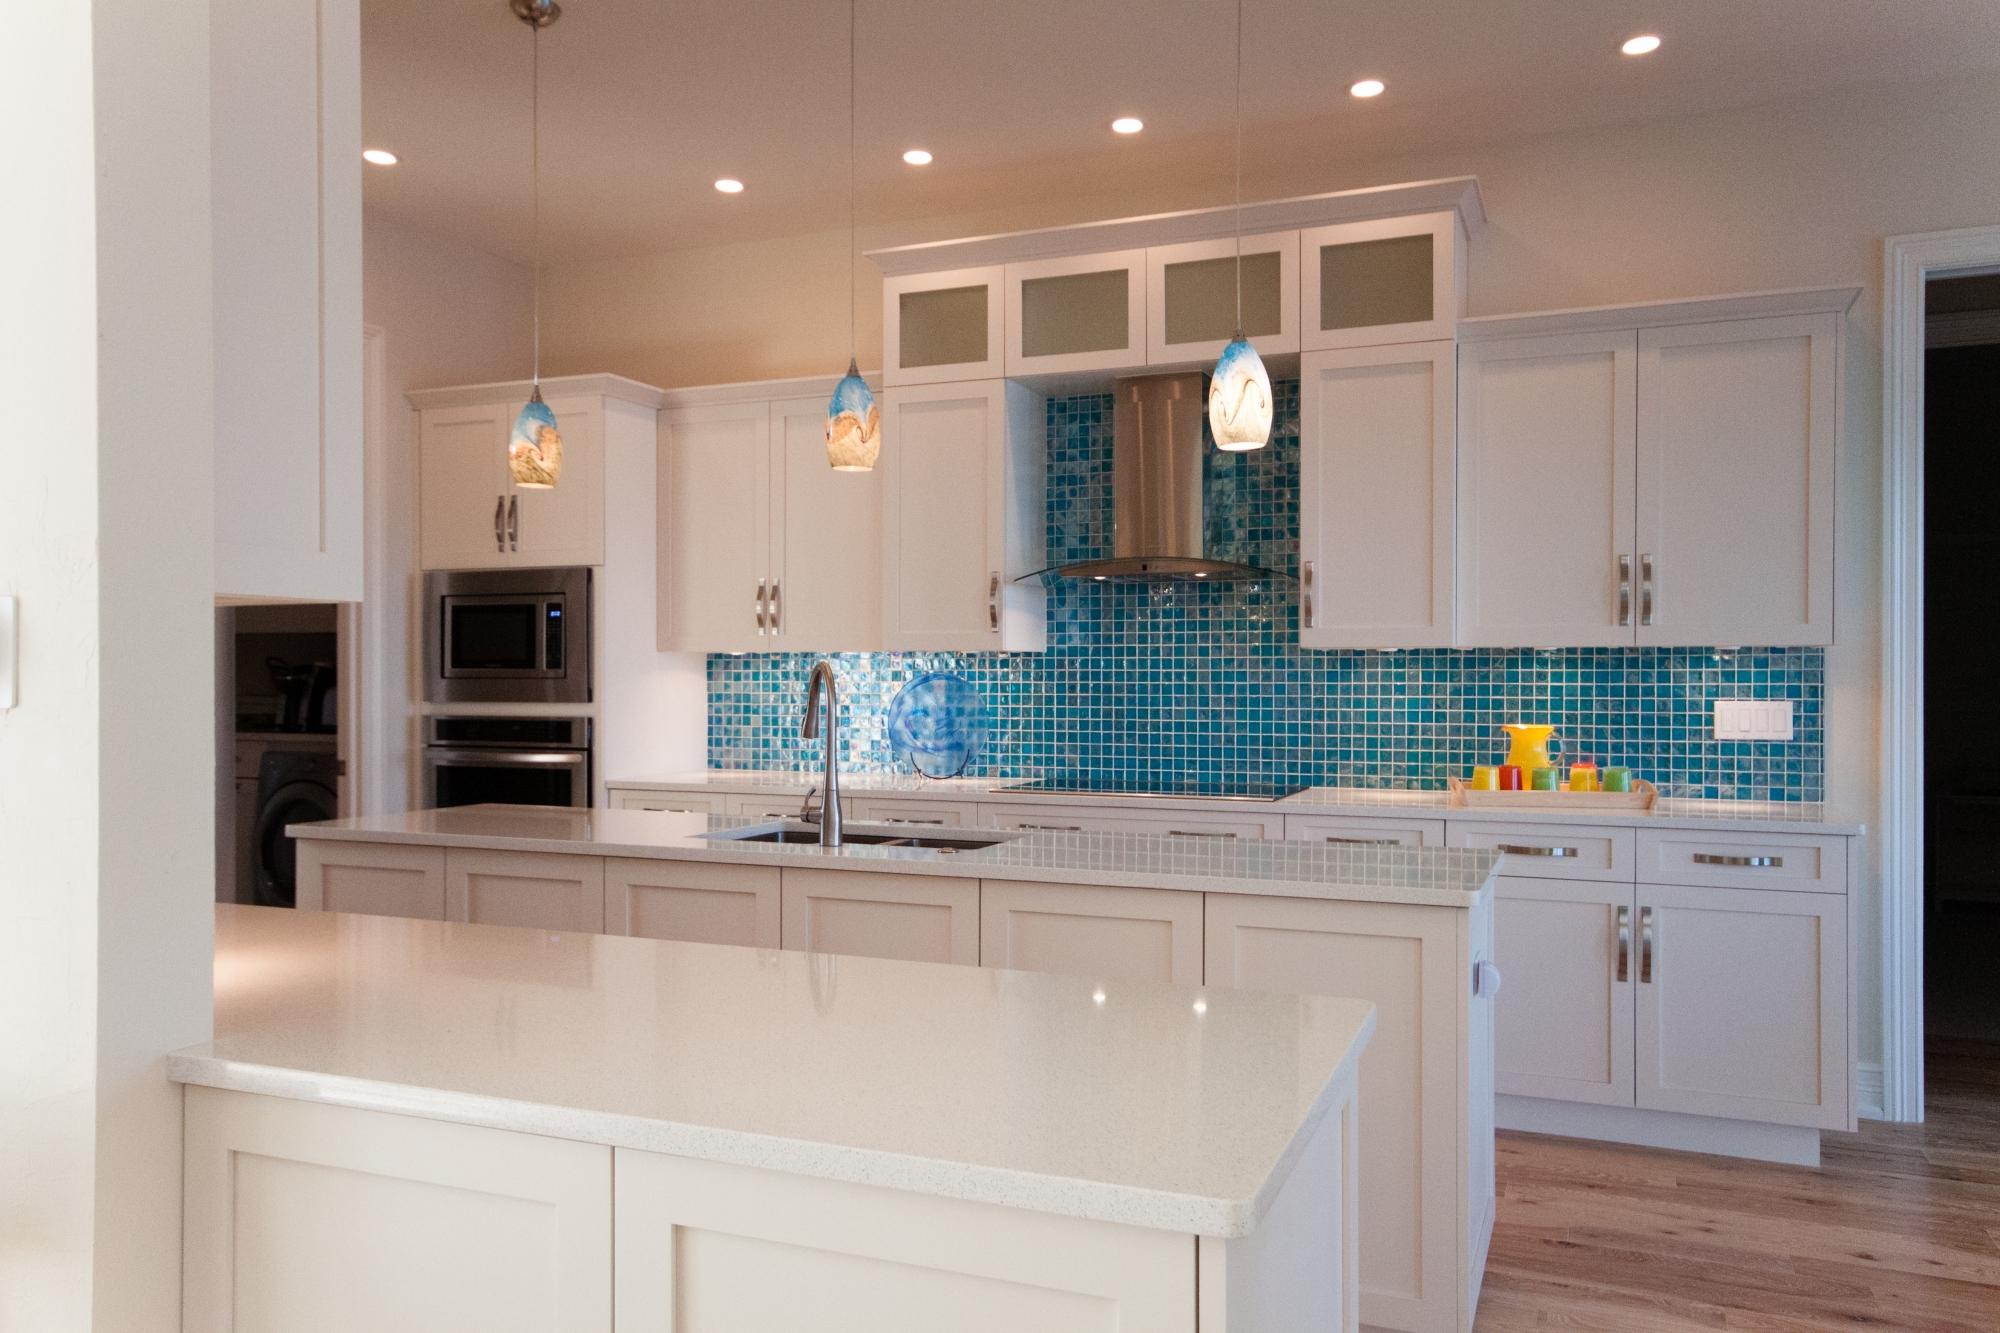 countertops countertop baths with golden kitchens backsplash fl granite gallery carrara full naples kitchen crystal